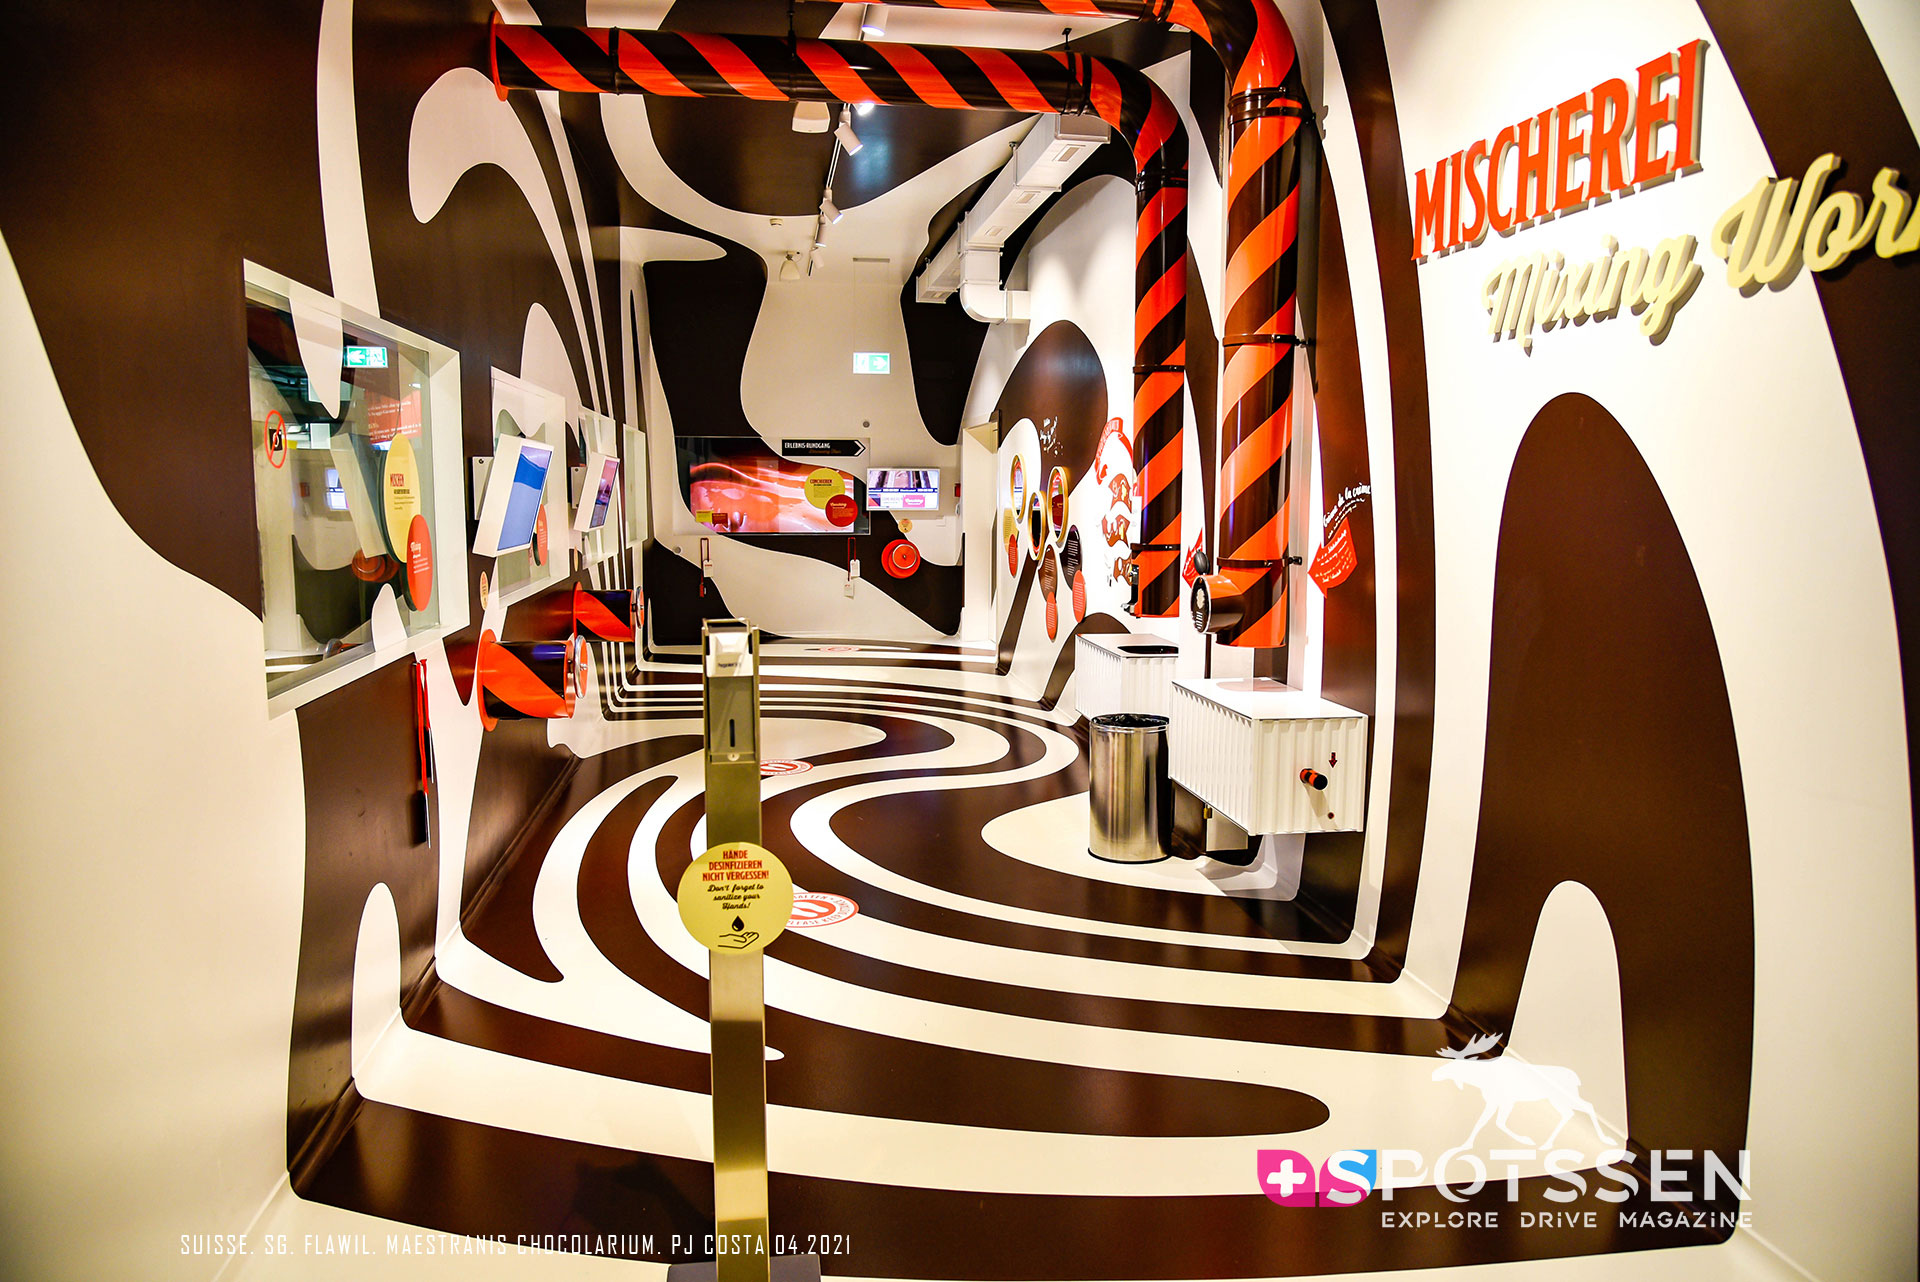 2021, chocolarium, maestrani's, flawil